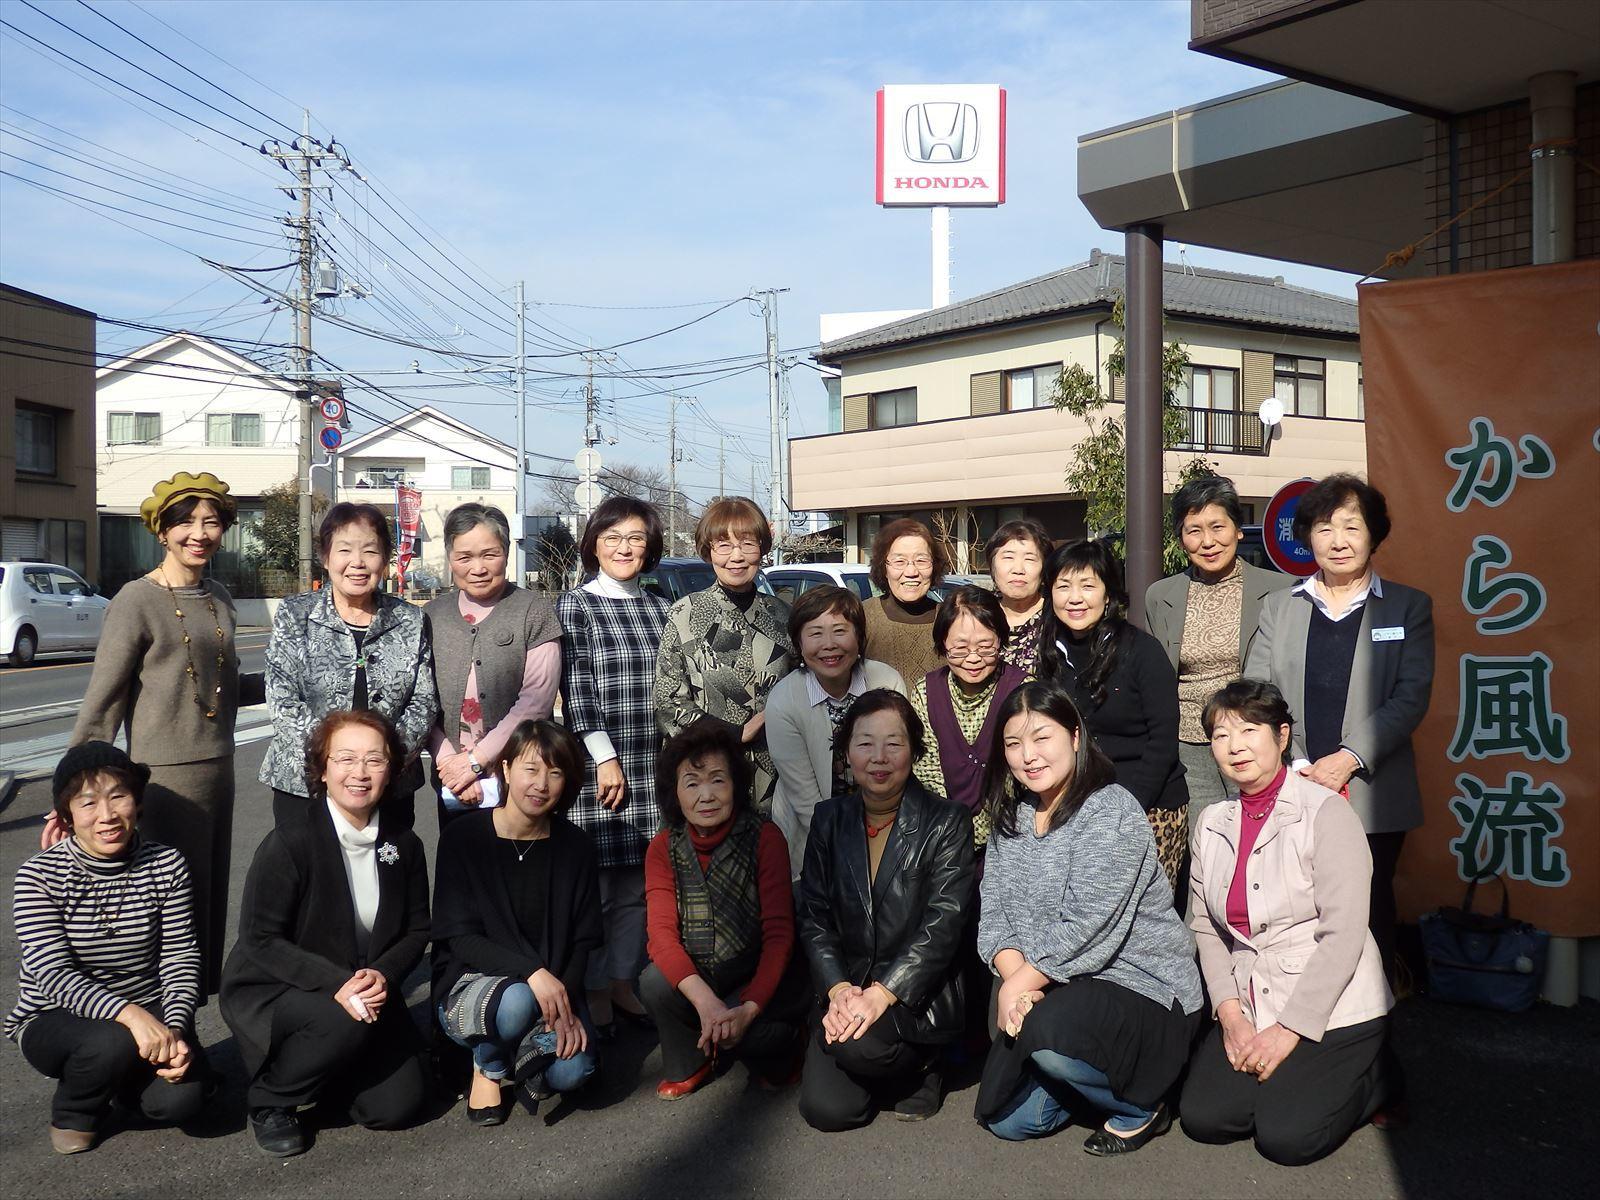 P2010159_Rr.jpg